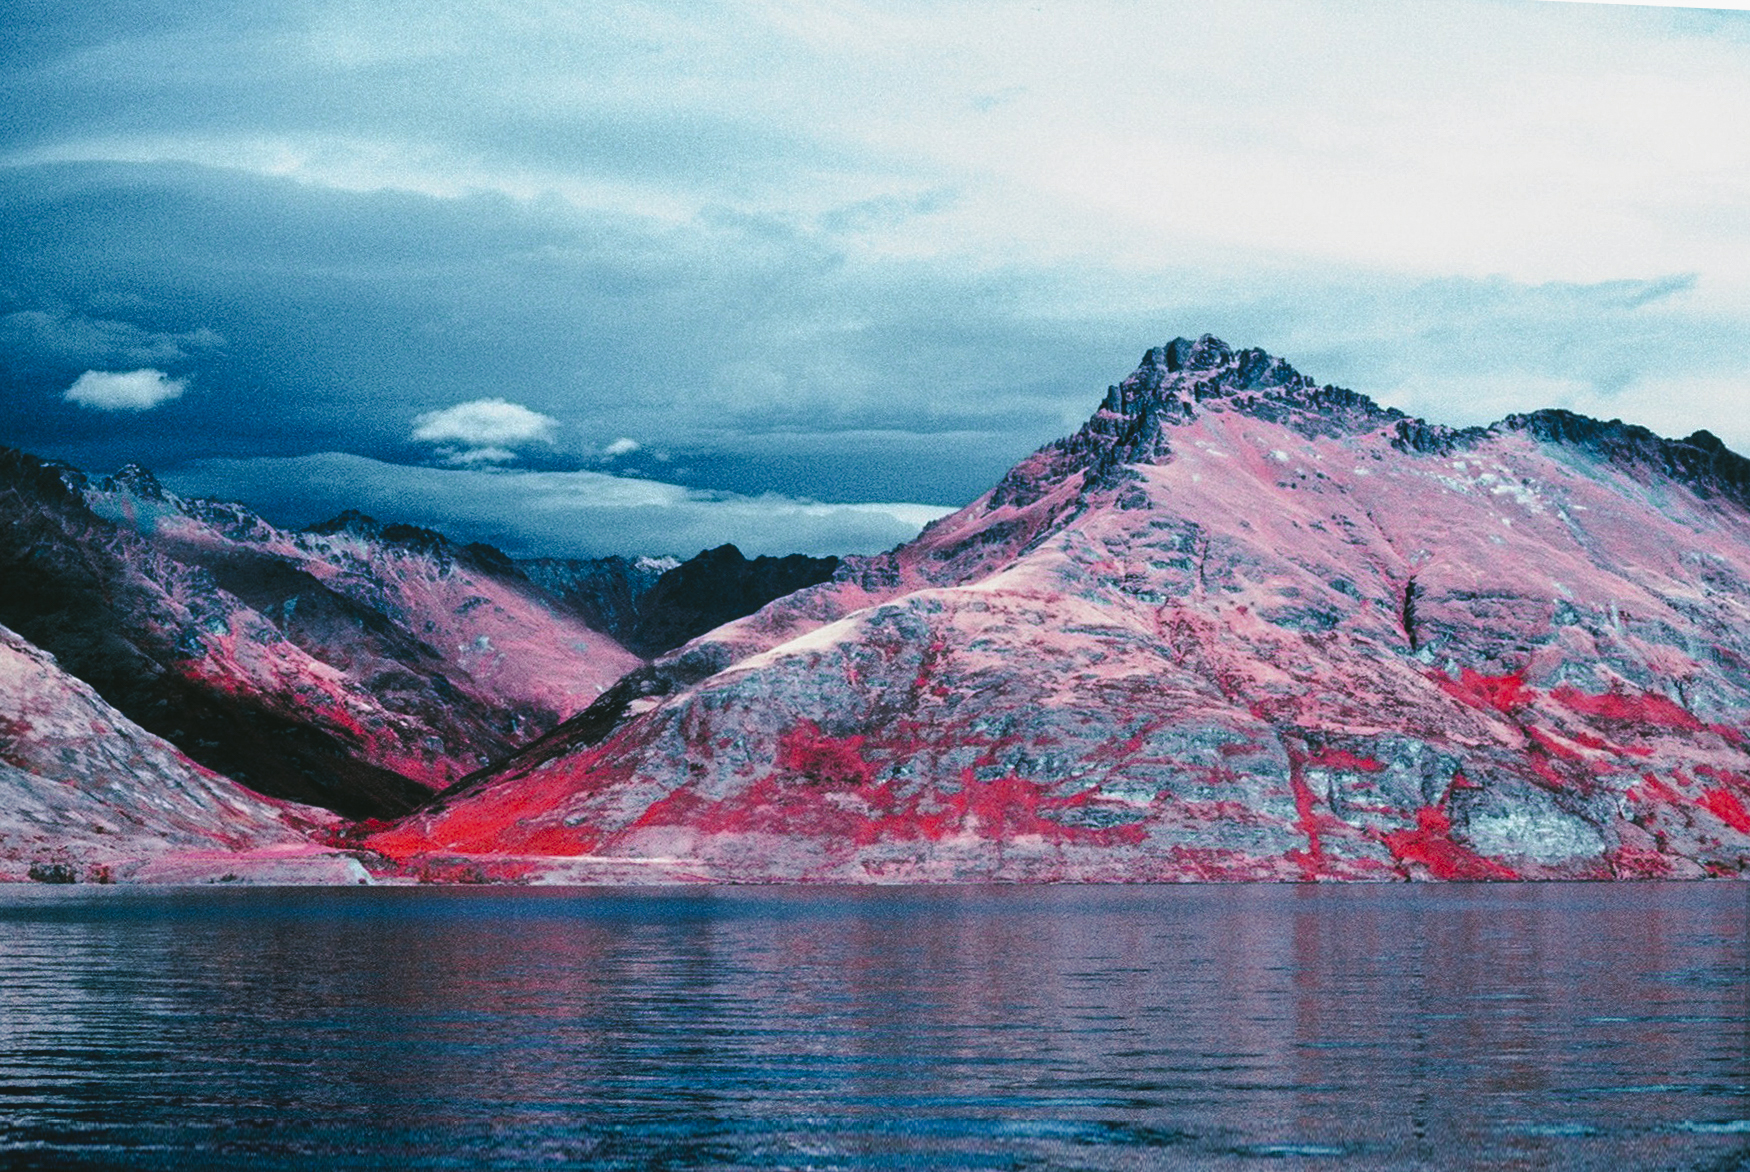 Infrared-New-Zealand-Kasia-Sykus-10.jpg